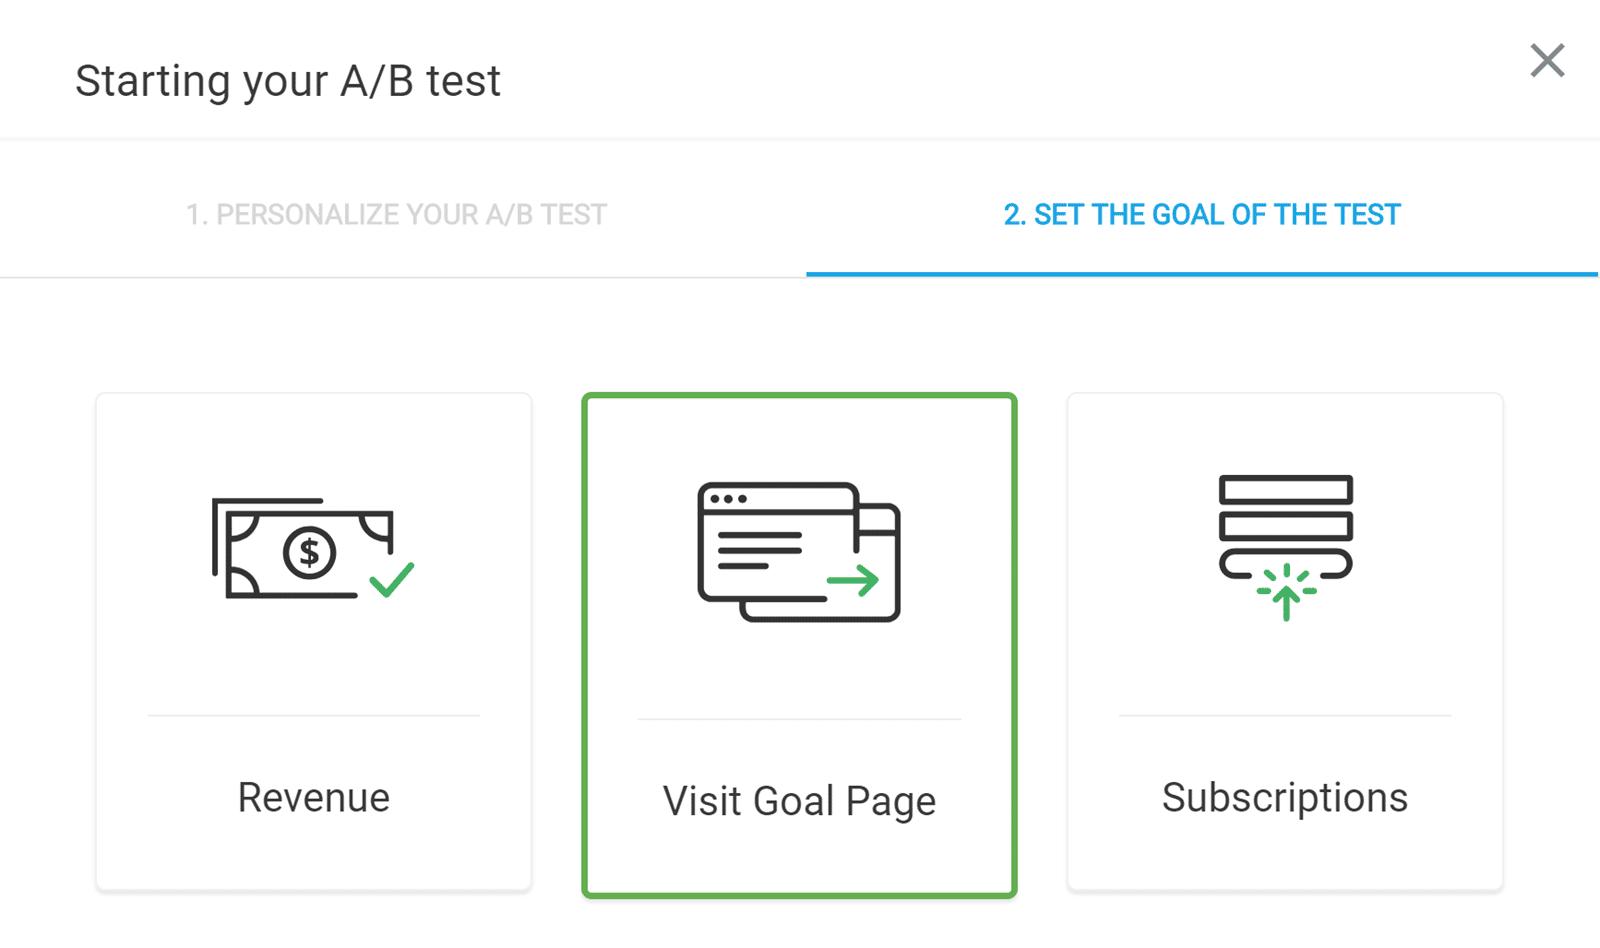 Elija un objetivo para la prueba